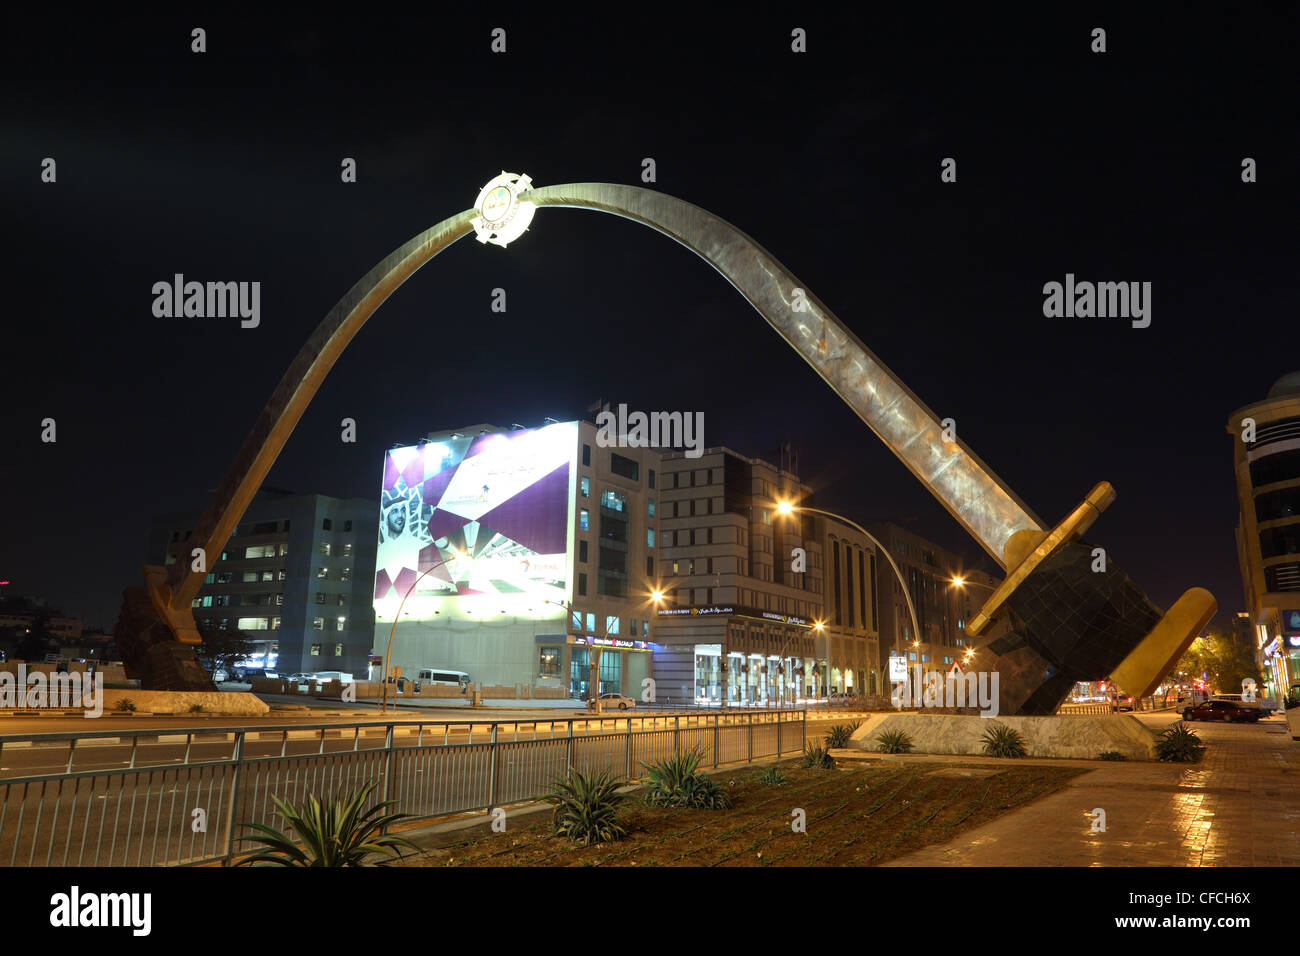 Arabic daggers monument in Doha, Qatar. - Stock Image